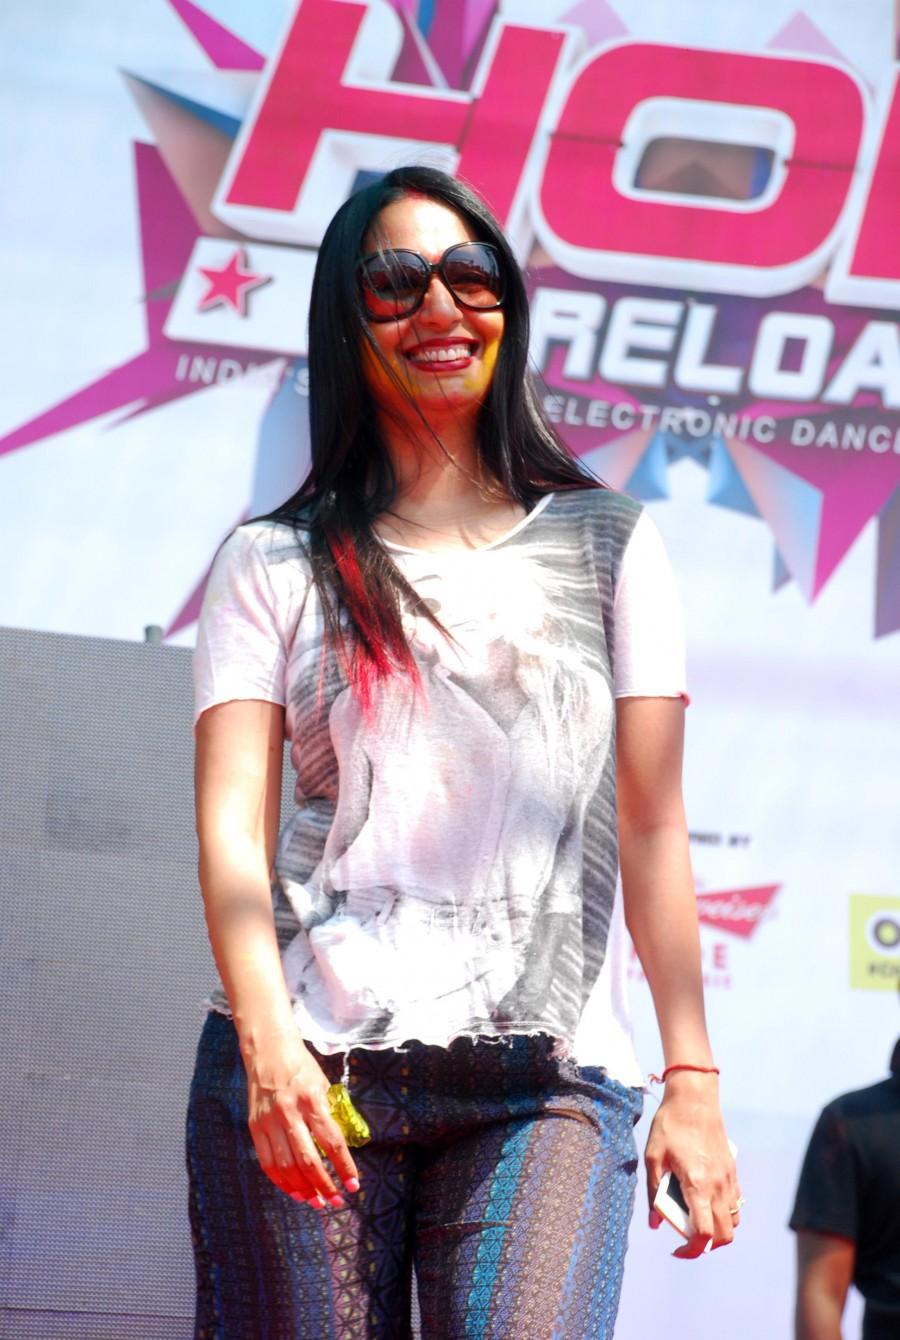 Holi celebration,holi 2015,#HappyHoli,TV actors,Television industry,kushal tandon,Bigg Boss,Apurva Agnihotri,Kamya Punjabi,Plus91 Reloaded,Ganesh Acharya,Hey Bro,Photos